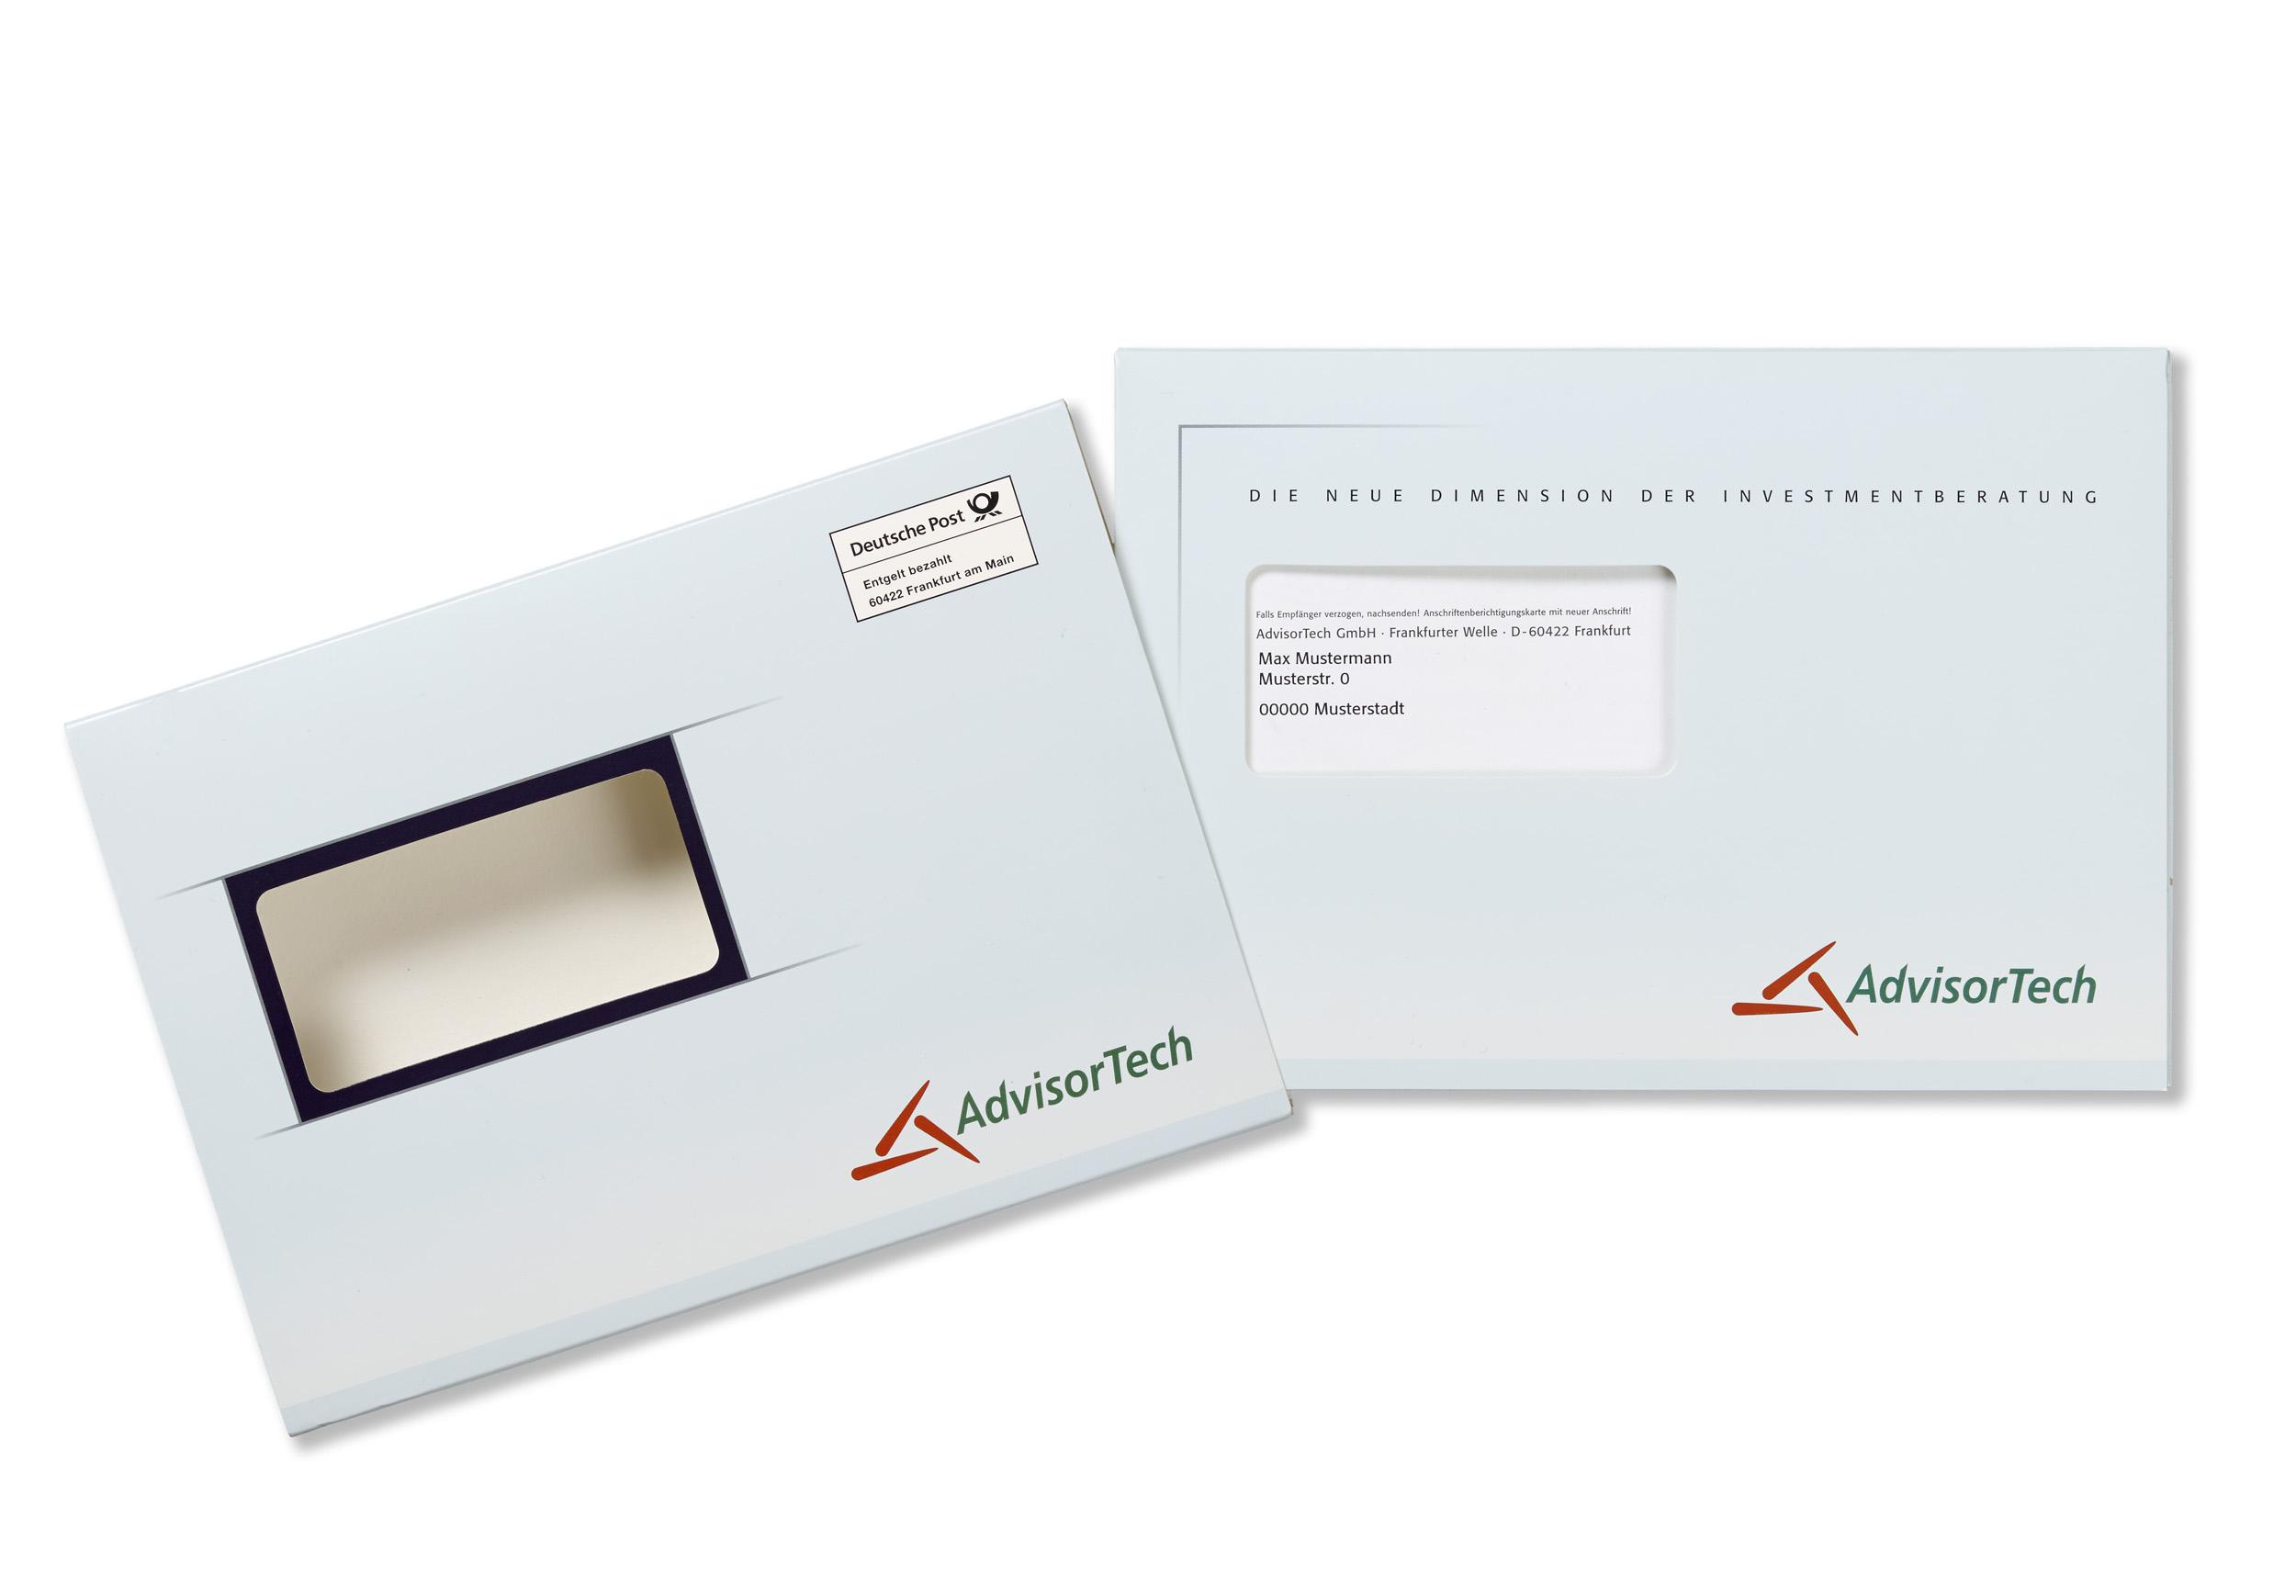 BlackertText AdvisorTech 02